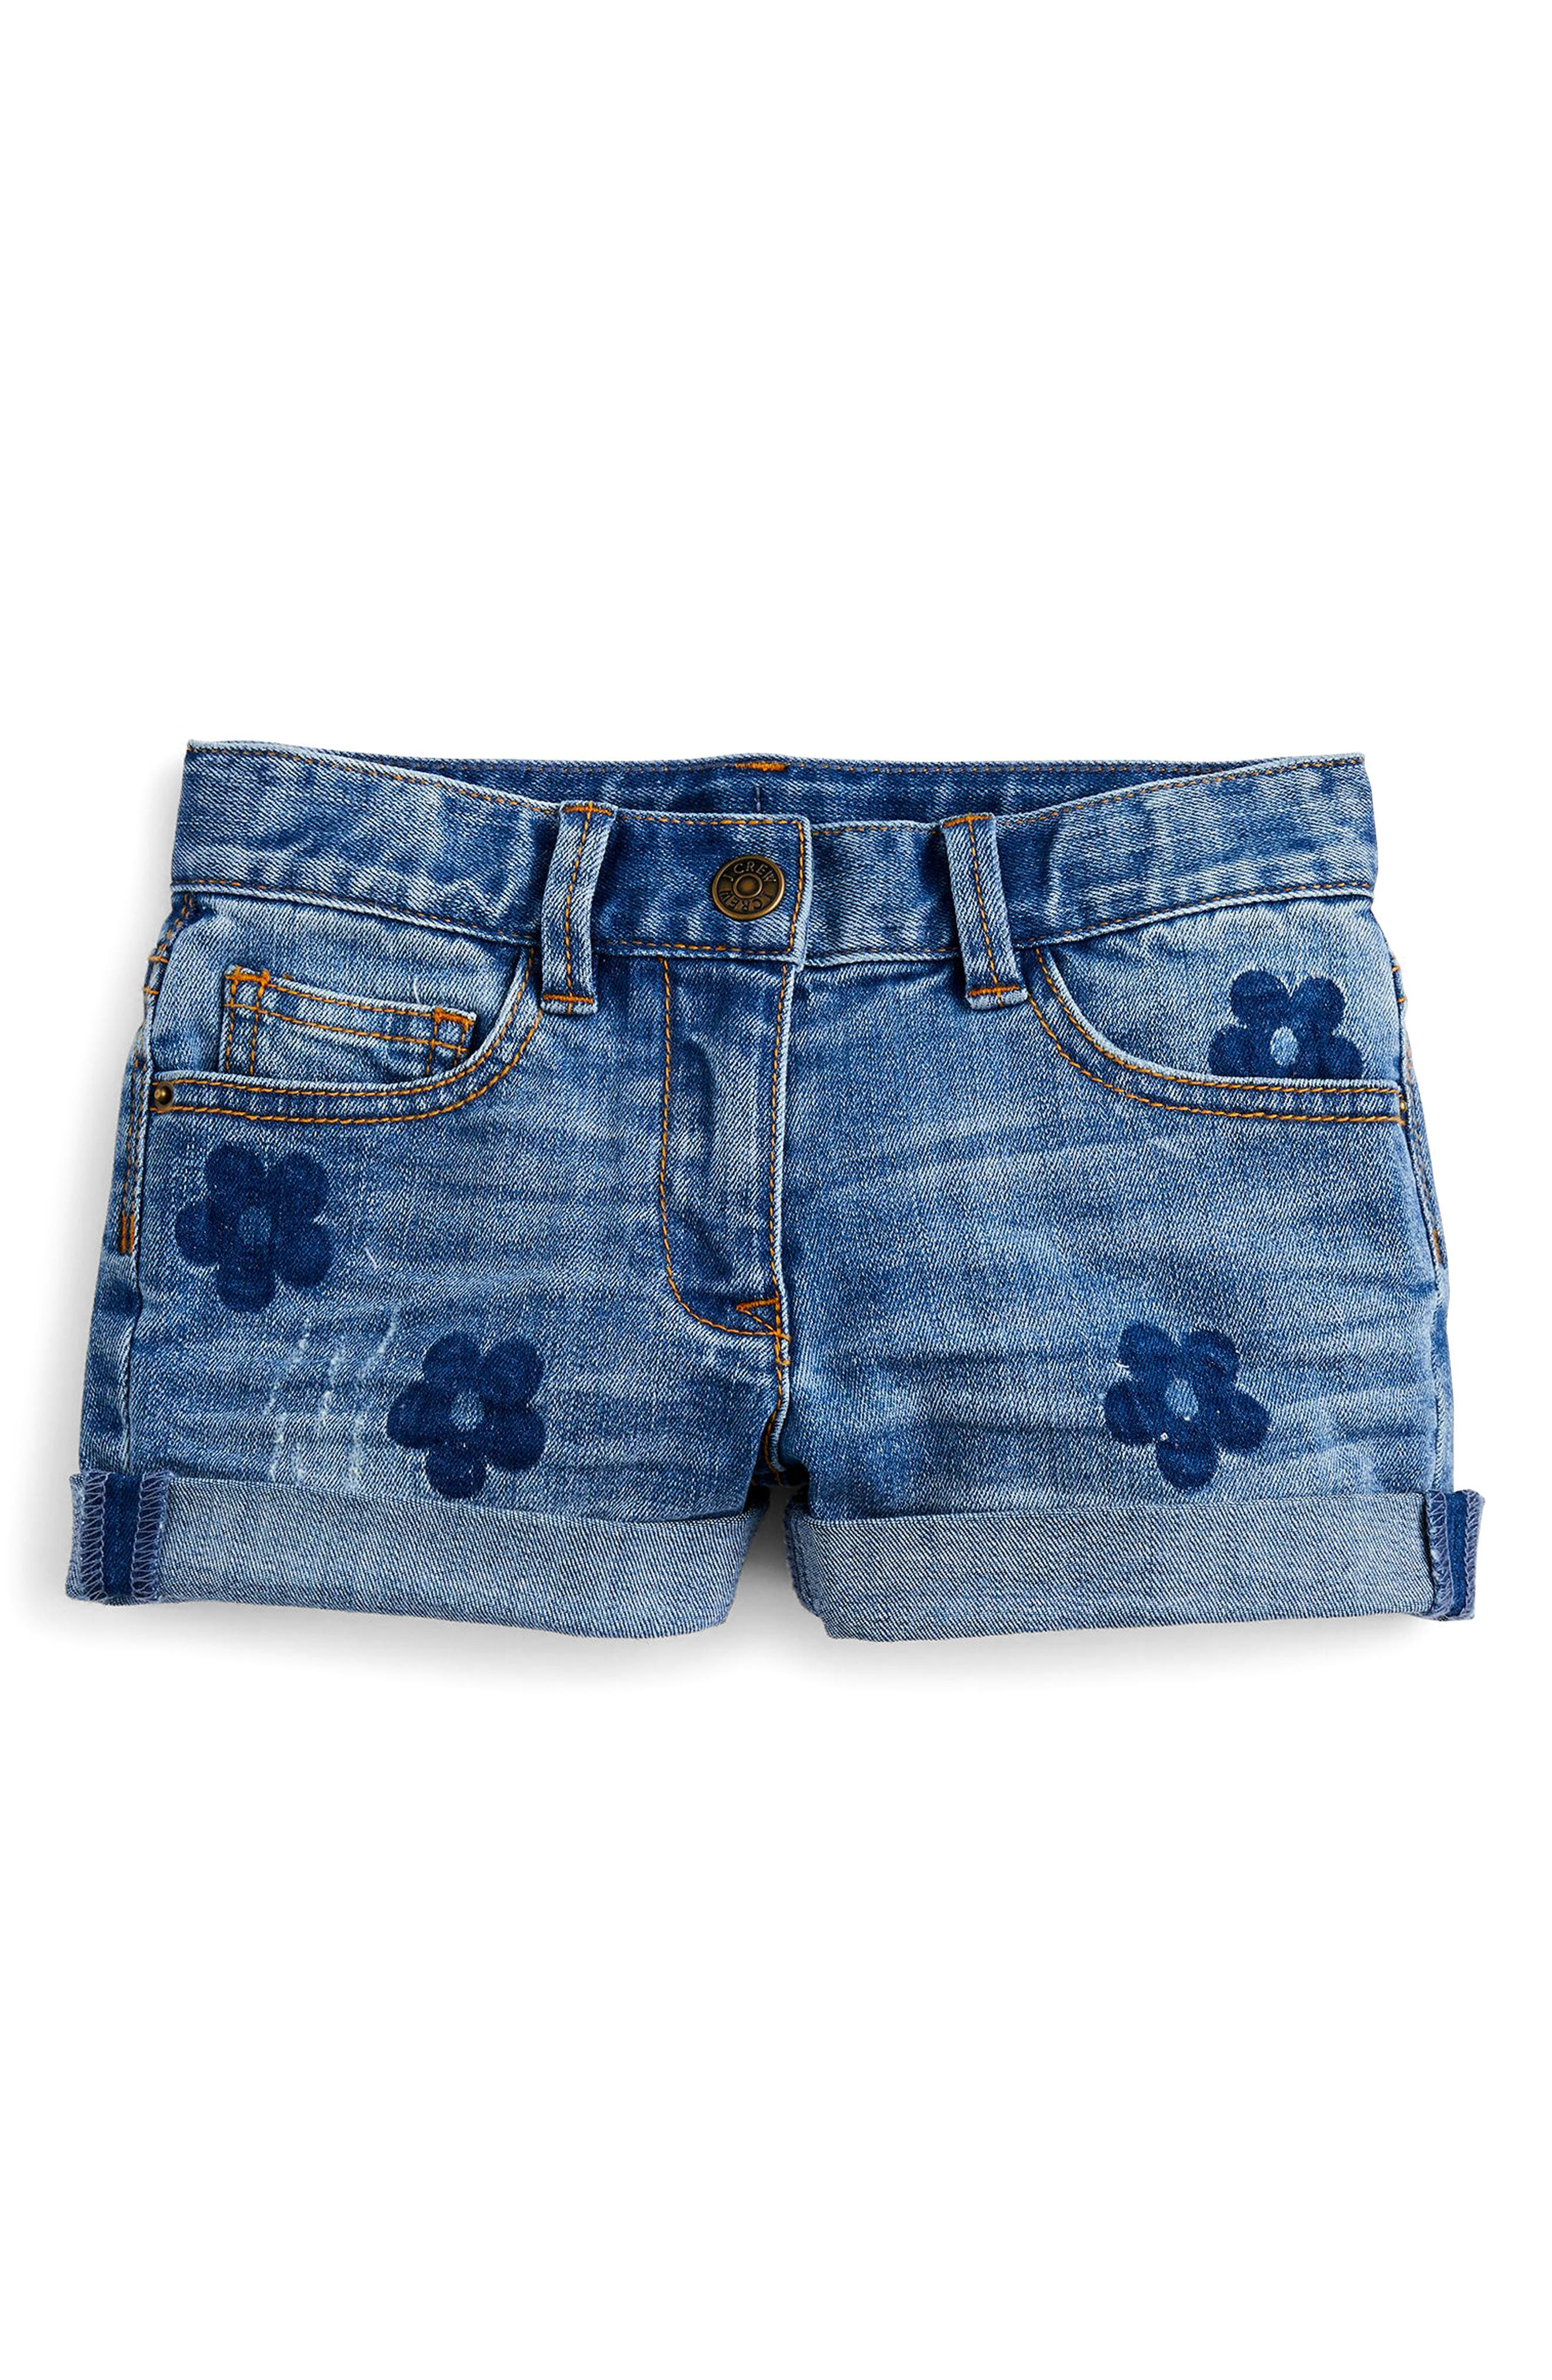 crewcuts by J. Crew Floral Denim Shorts (Toddler Girls, Little Girls & Big Girls)